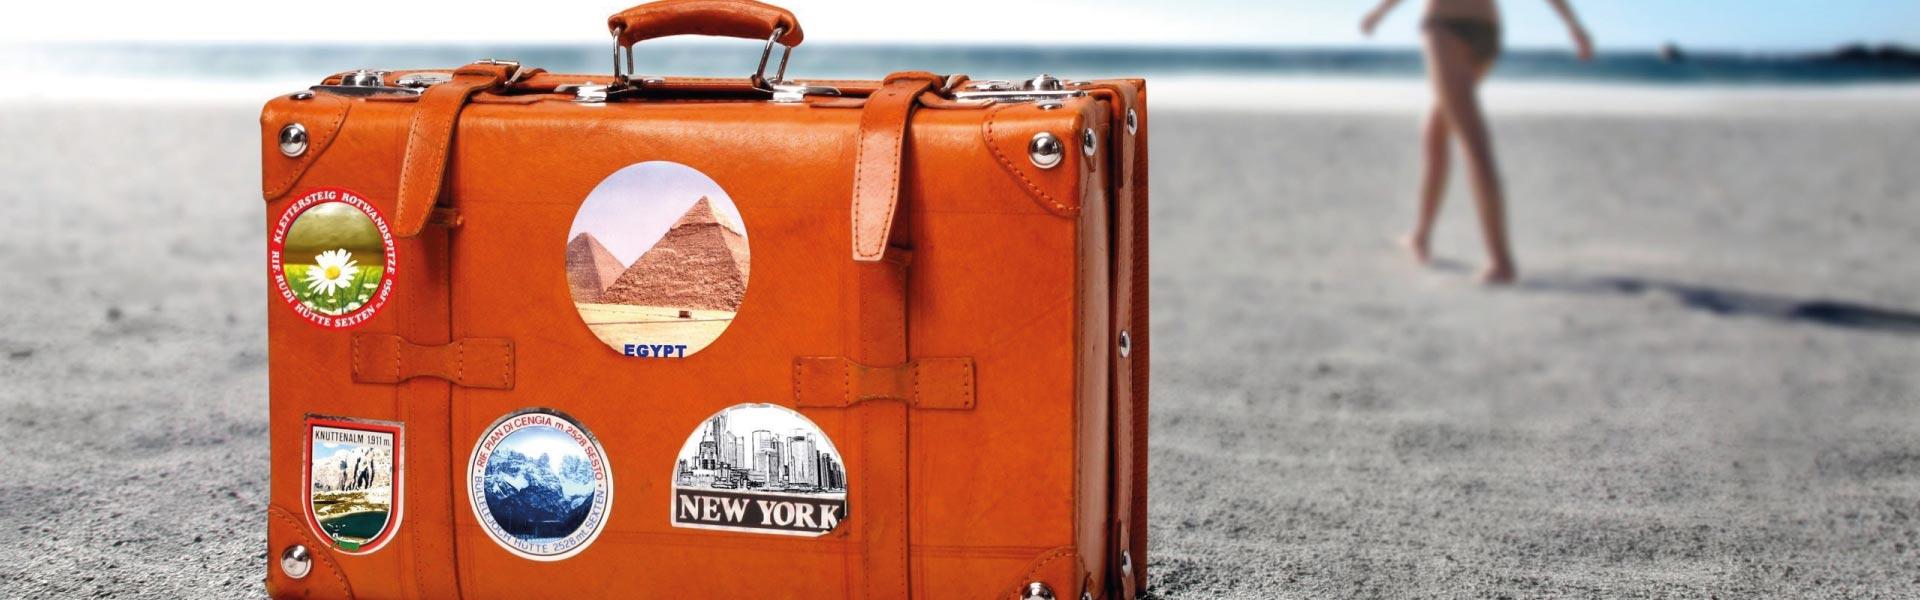 Fazendo as malas para Viajar!